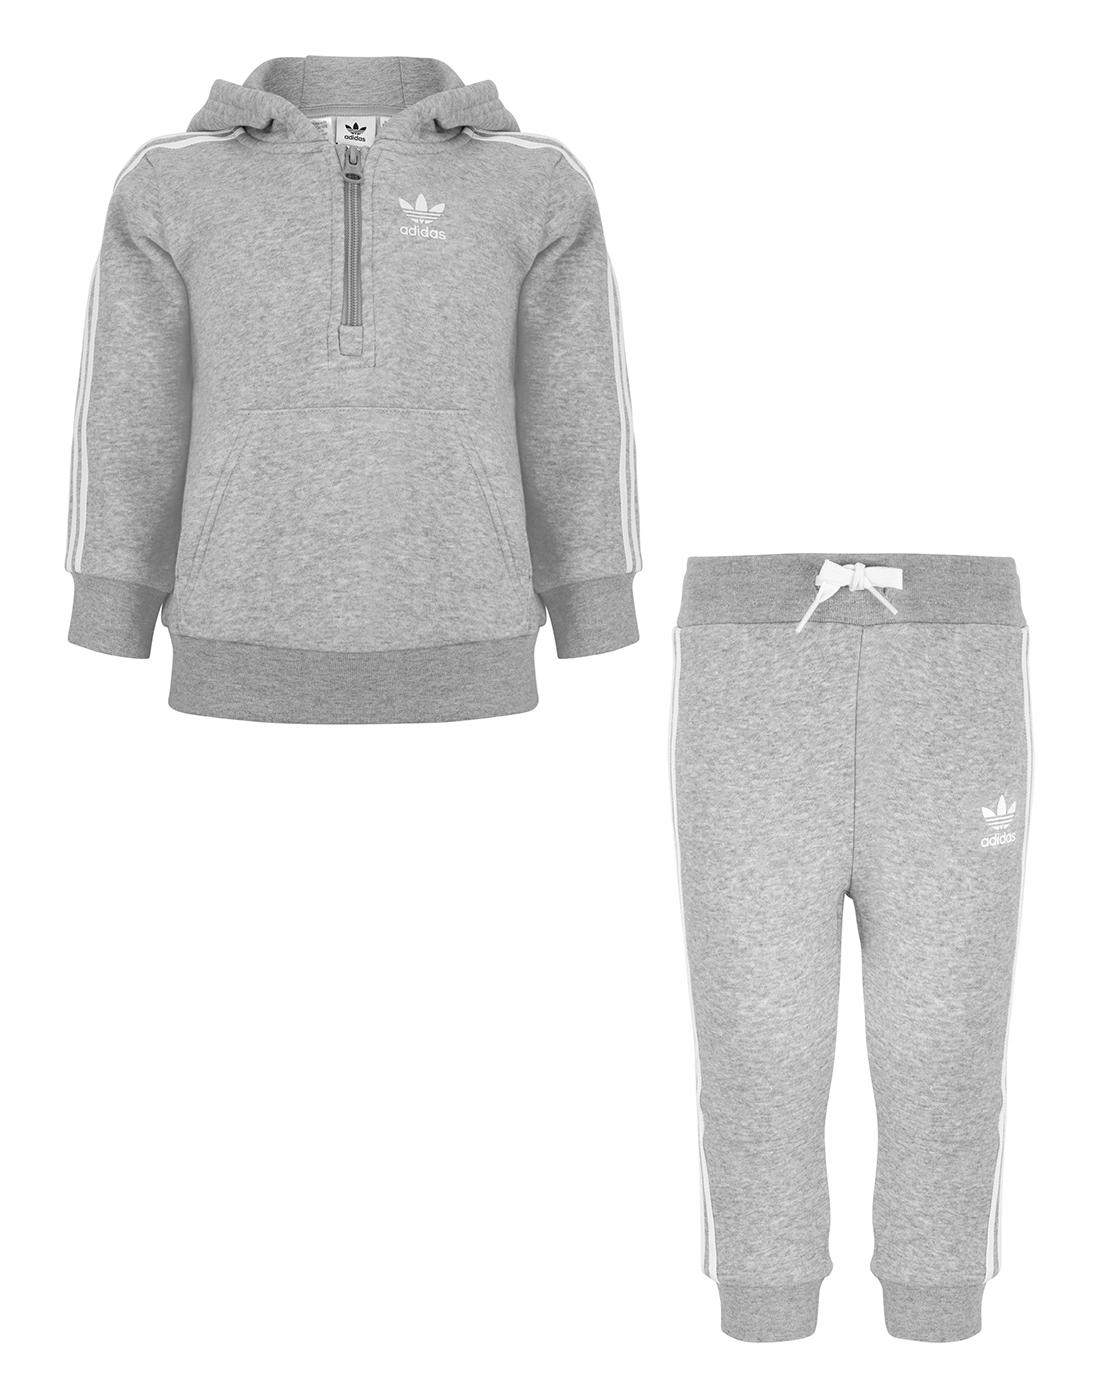 c3f58bded001 adidas Originals. Infant Boys Trefoil Jogger. Infant Boys Trefoil Jogger ...